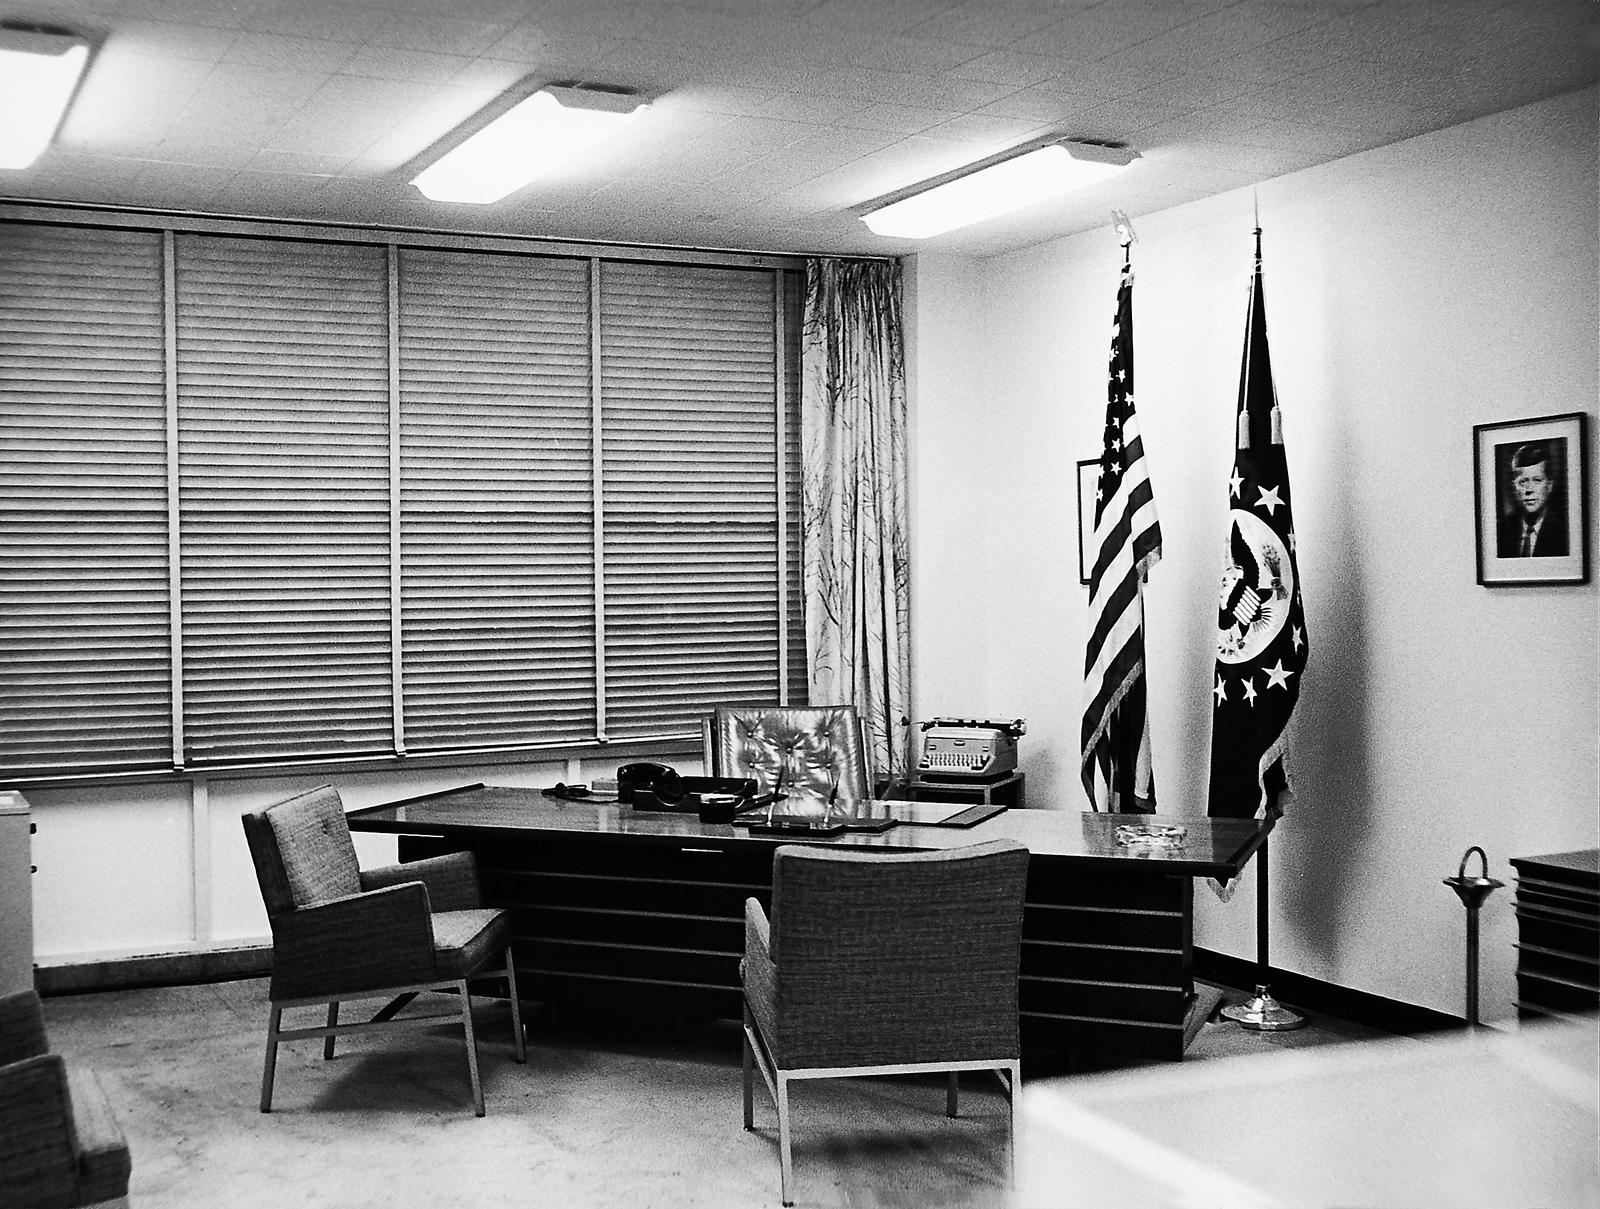 Caracas - Chancery Office Building - 1964